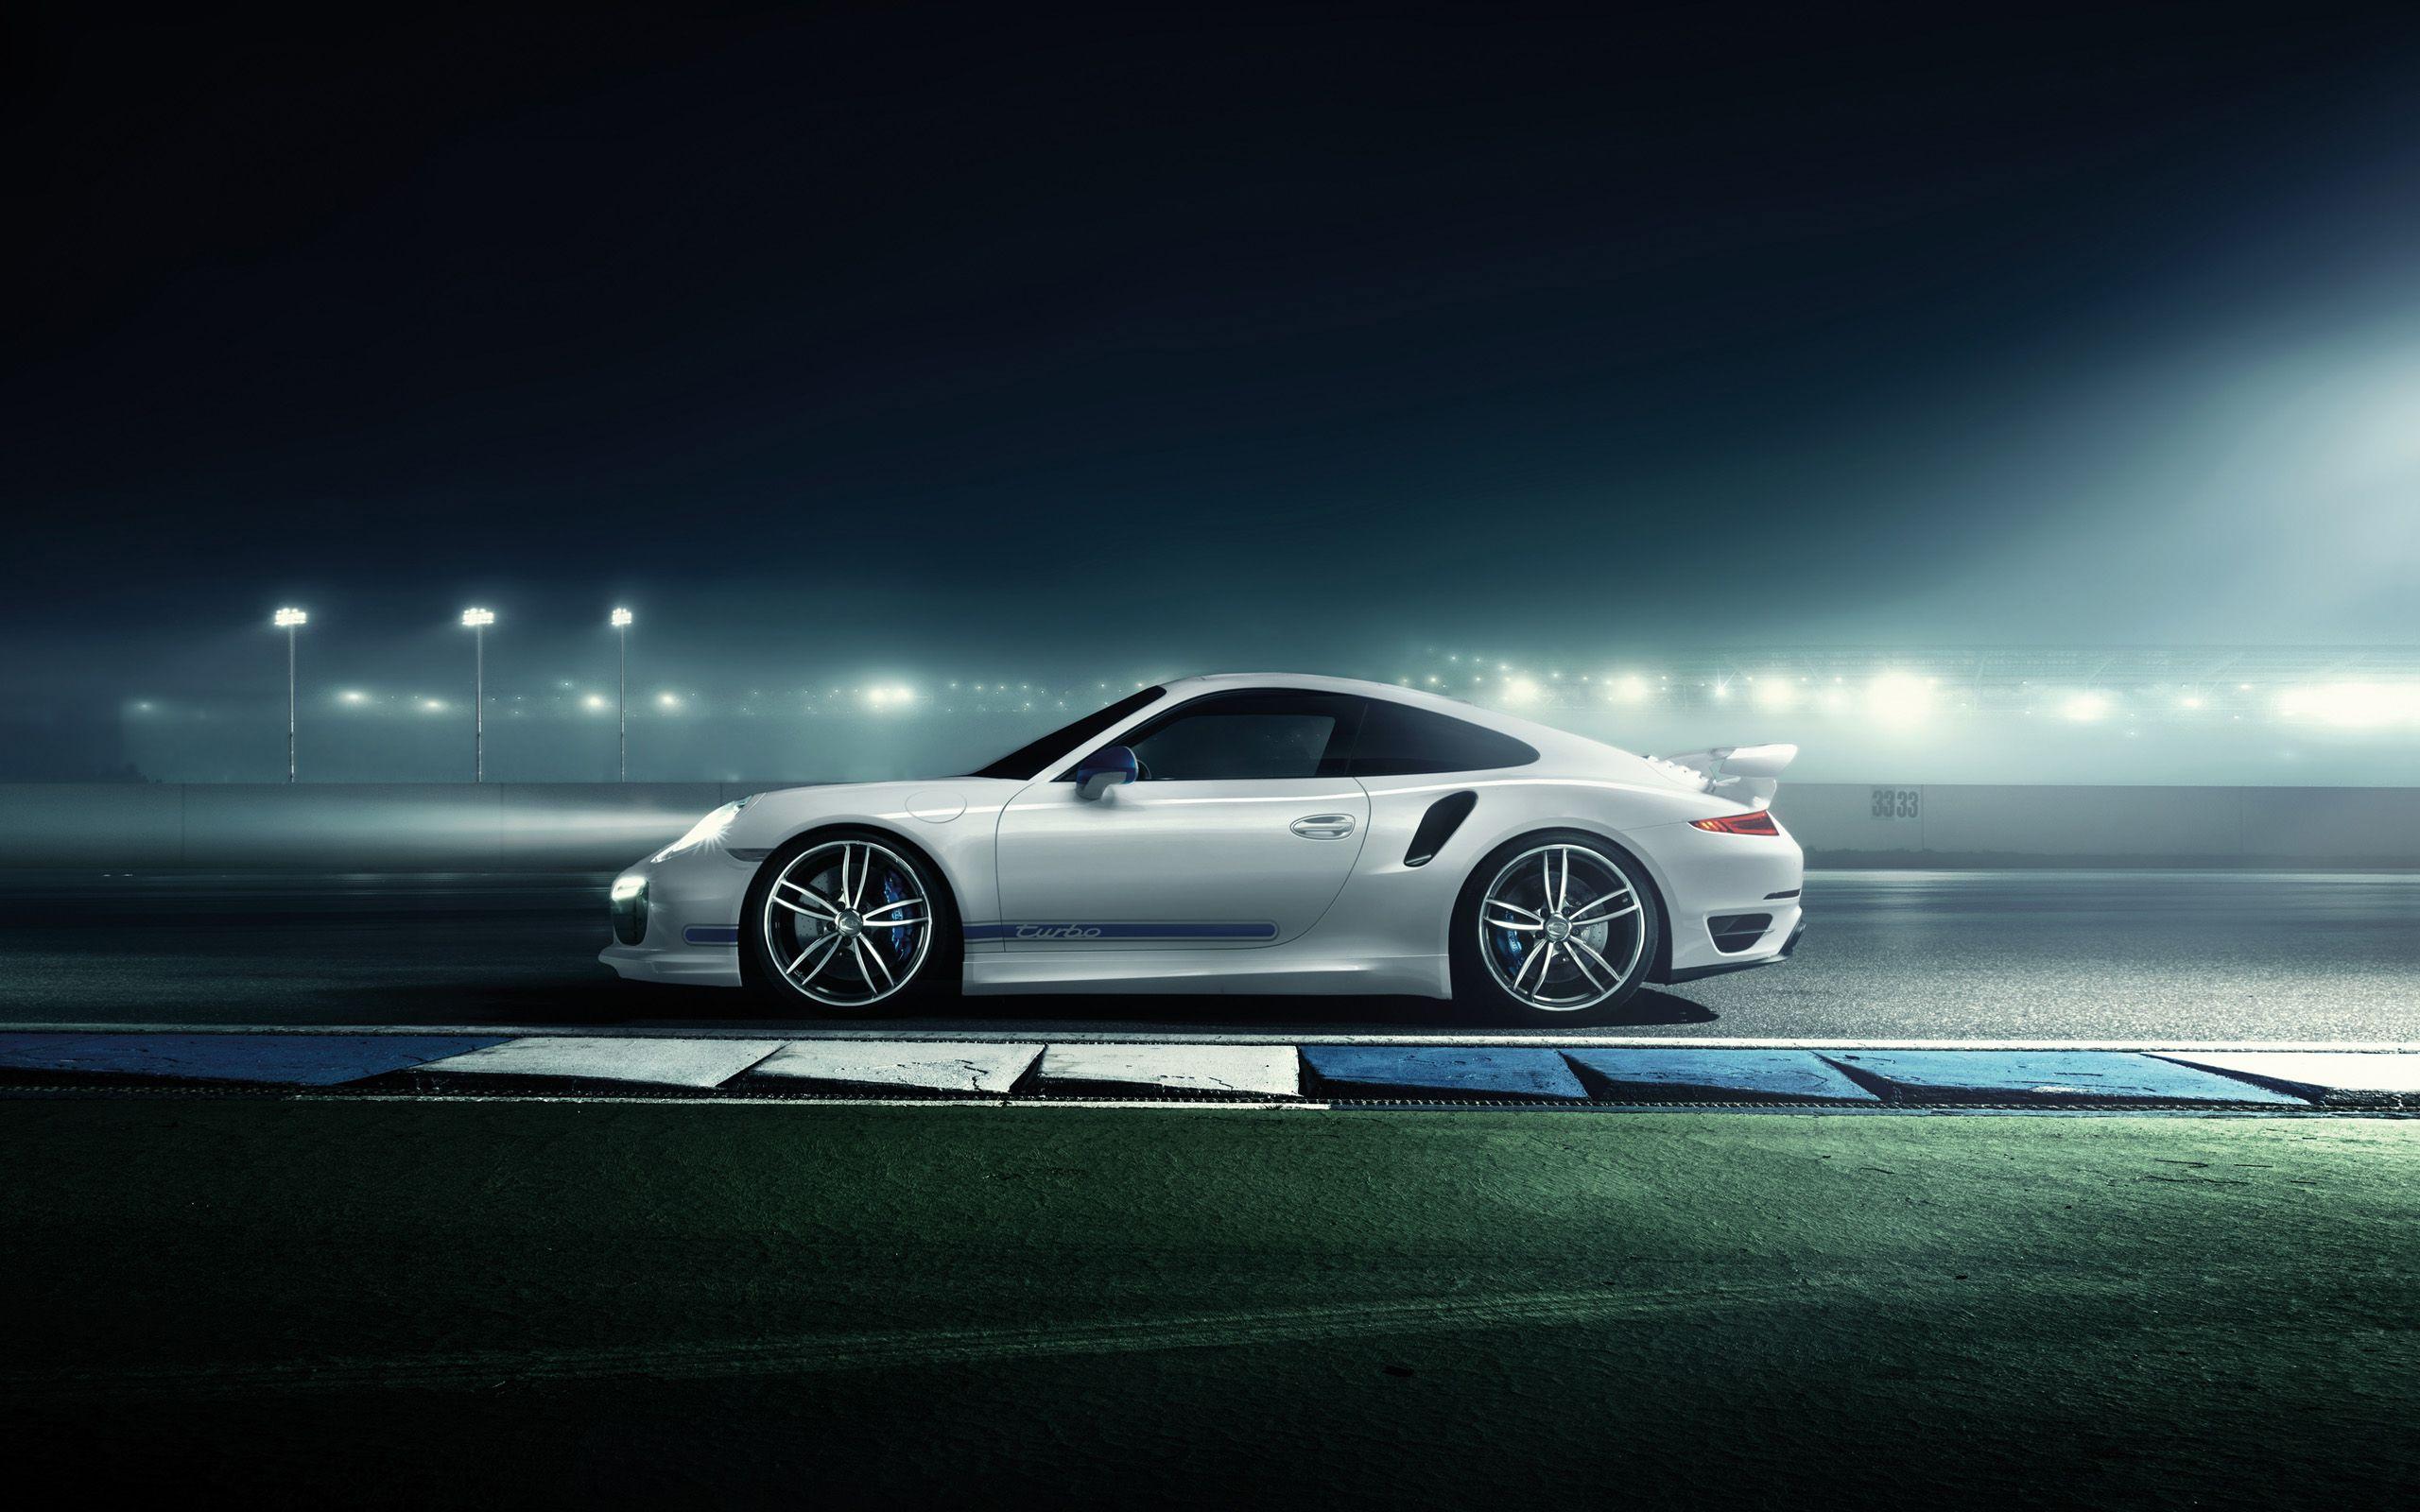 Car Wallpaper High Definition Wiw Porsche 911 Porsche 911 Turbo 911 Turbo S